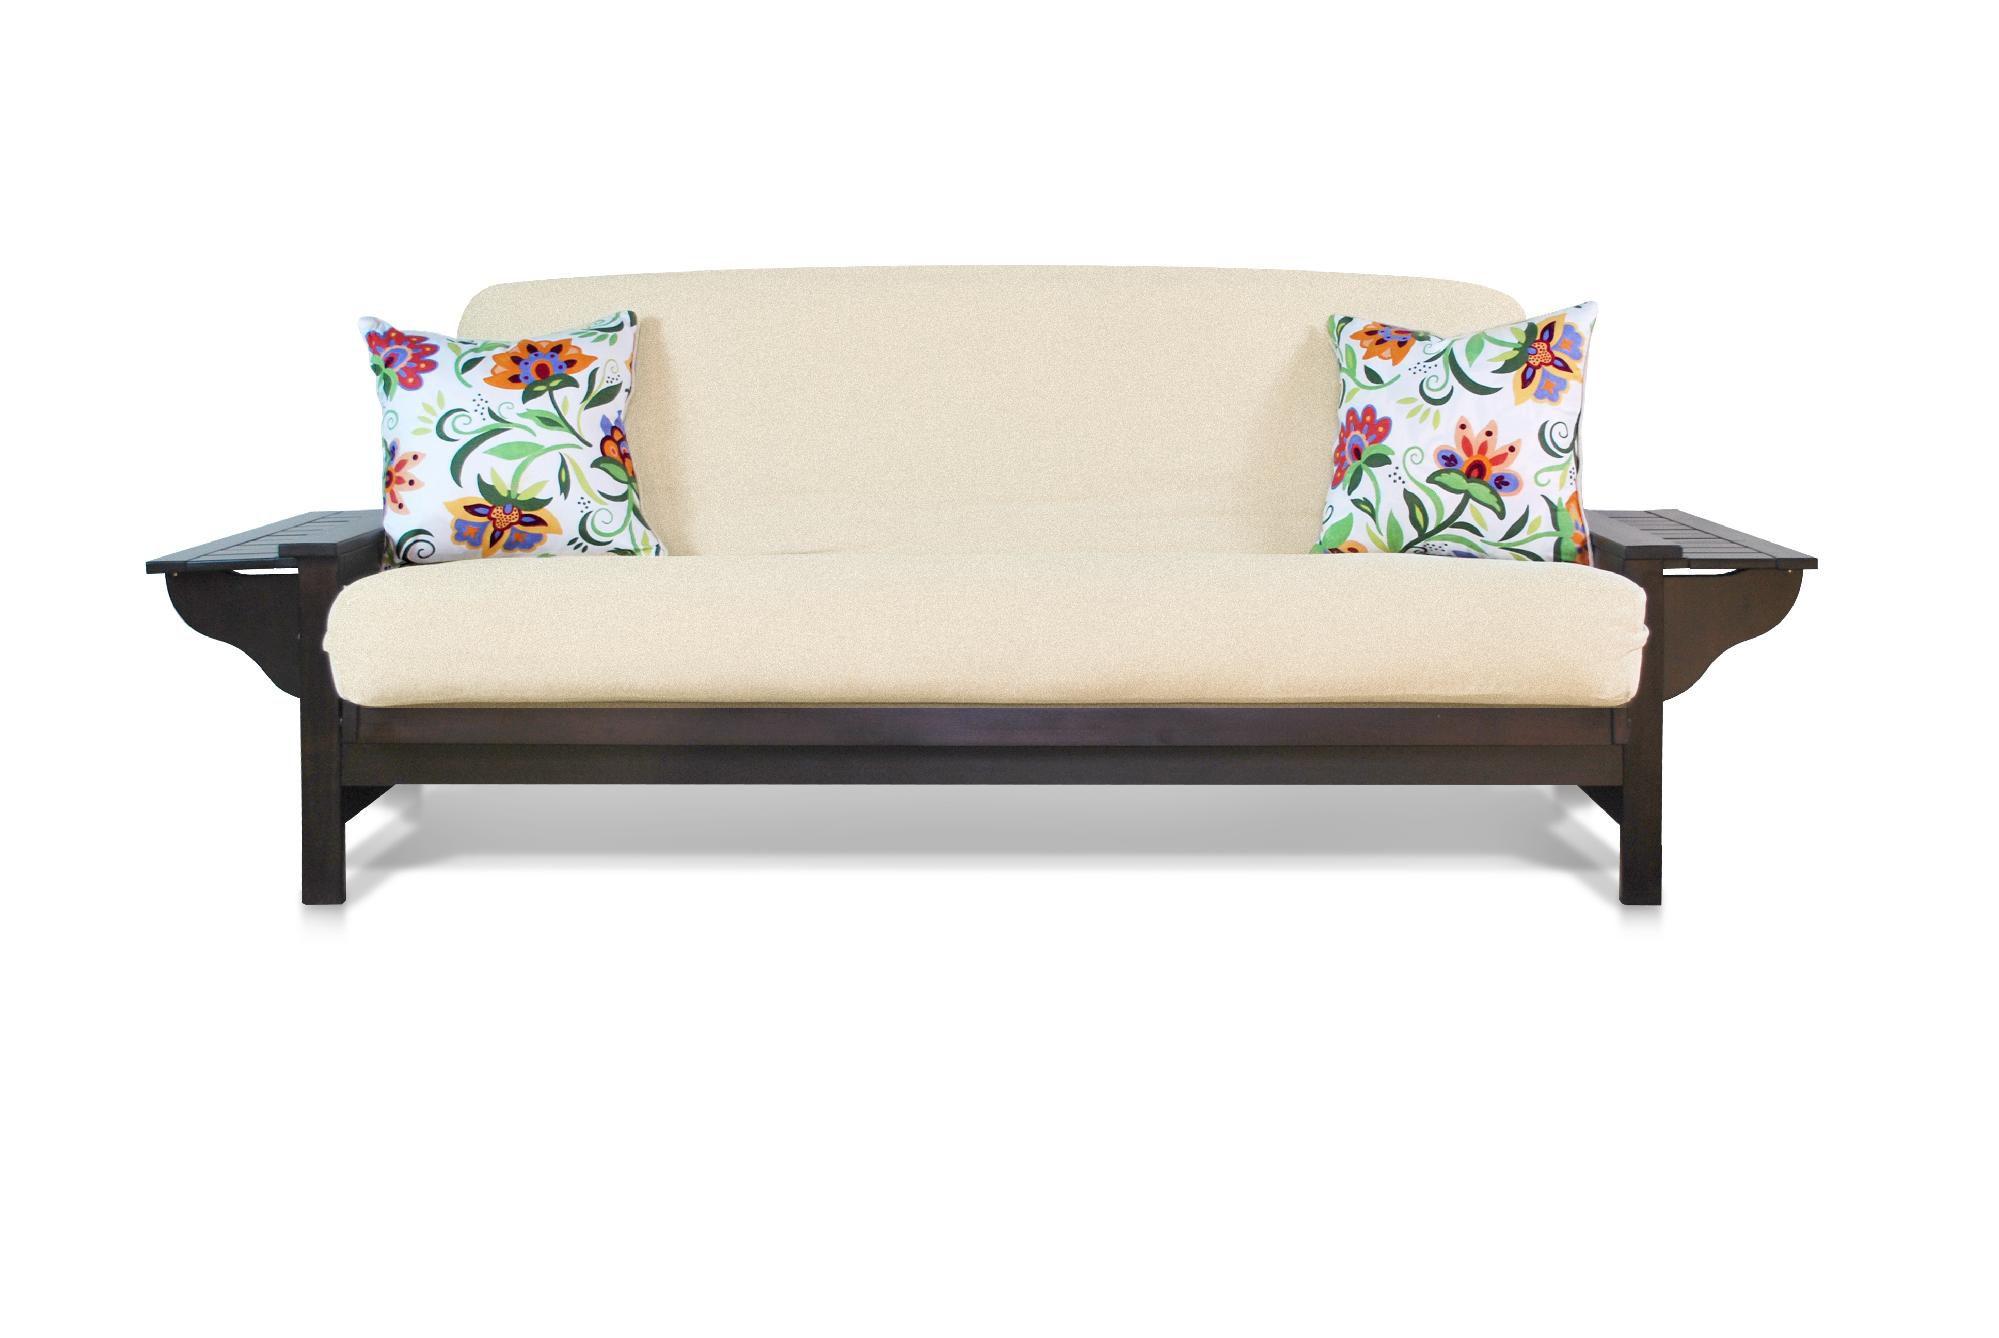 sofa bed covers kmart milan white leather american furniture alliance futon cover set big botanica